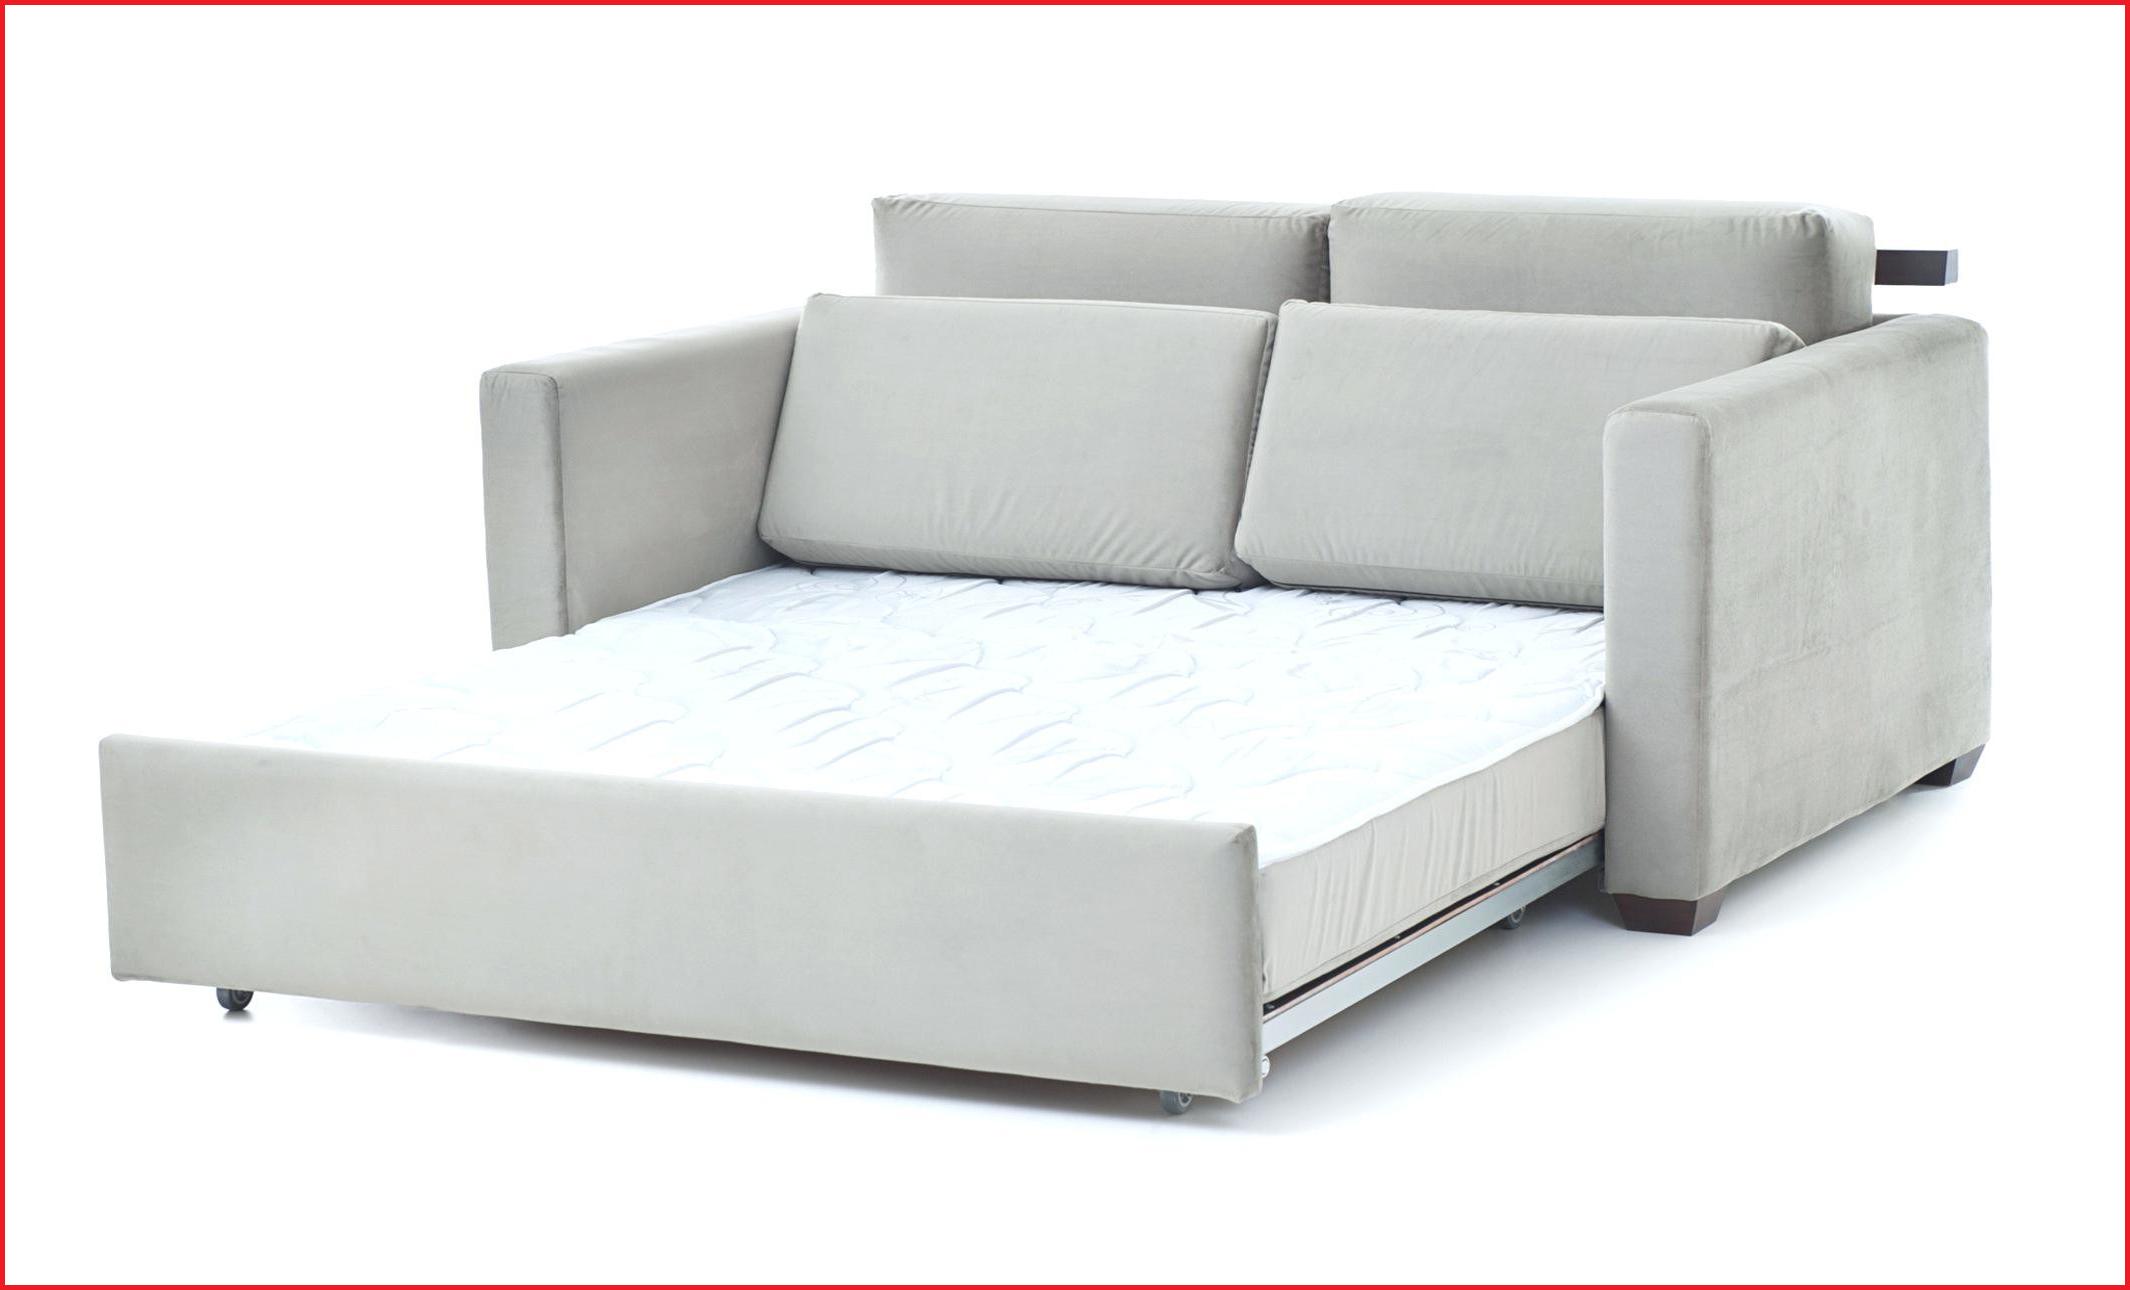 Carrefour sofas Cama 3id6 sofas Cama En Carrefour Ideas sofa Cama Litera Cruces